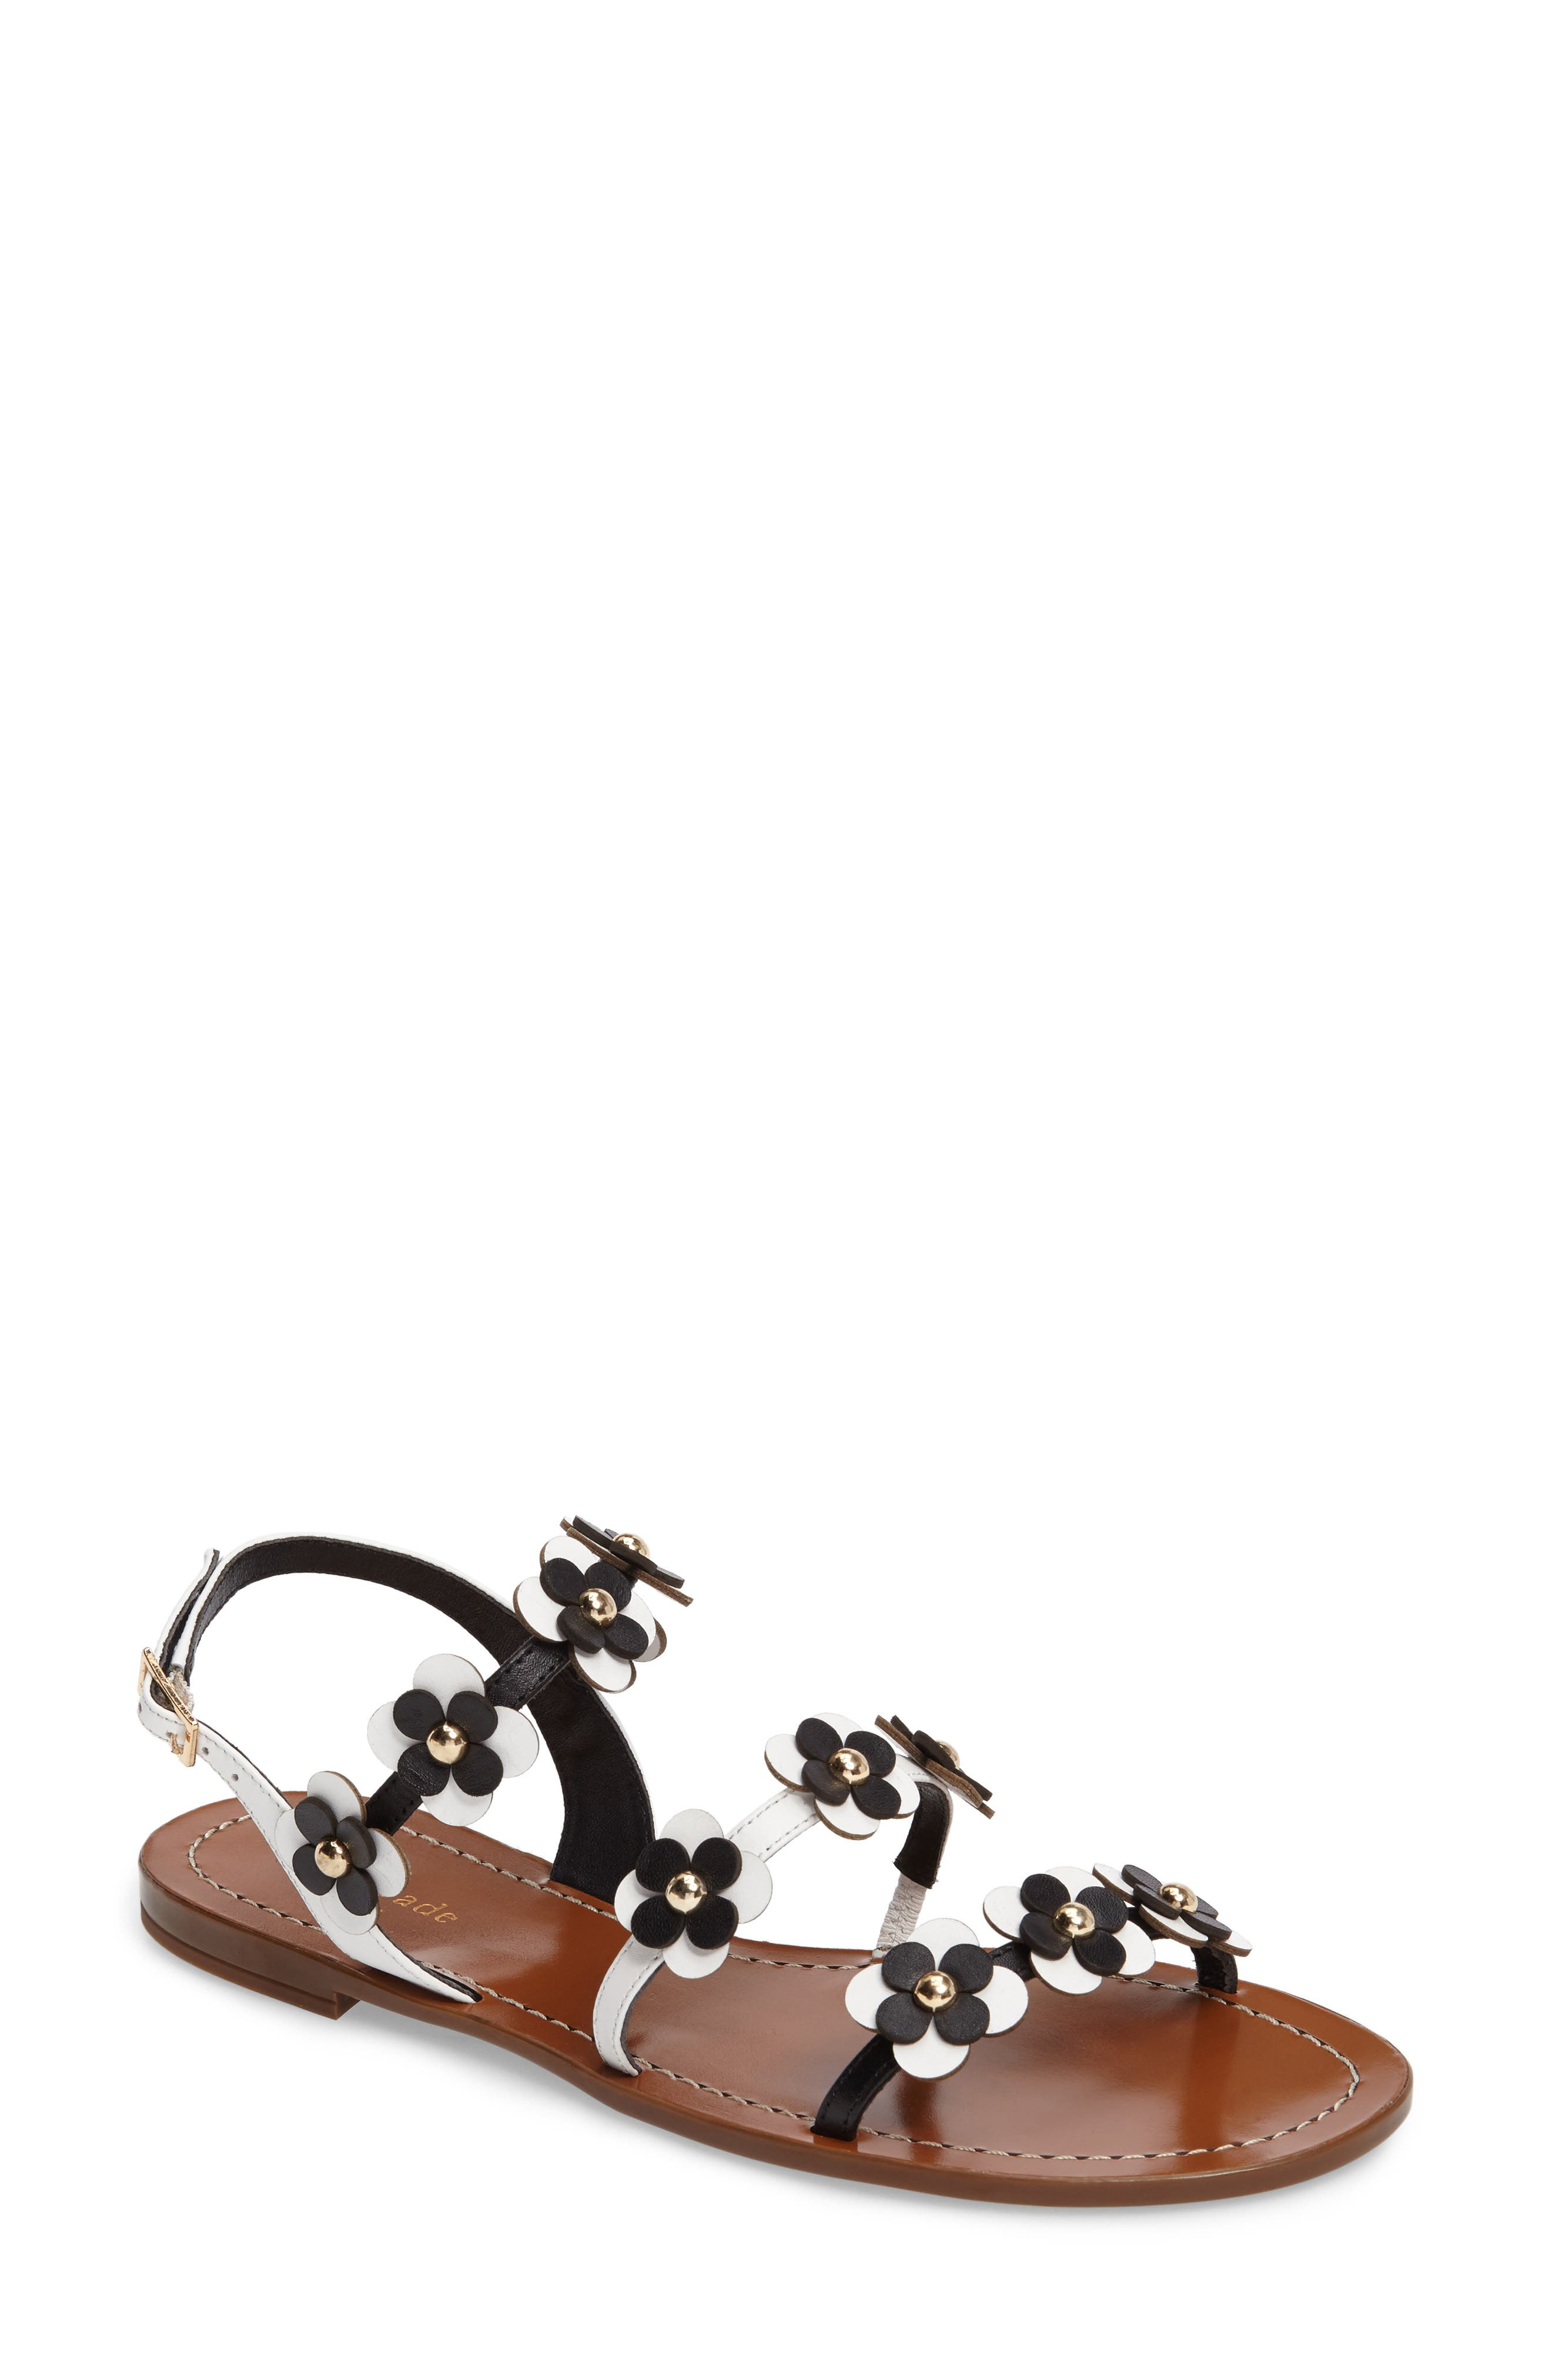 Main Image - kate spade new york colorado flowered sandal (Women)